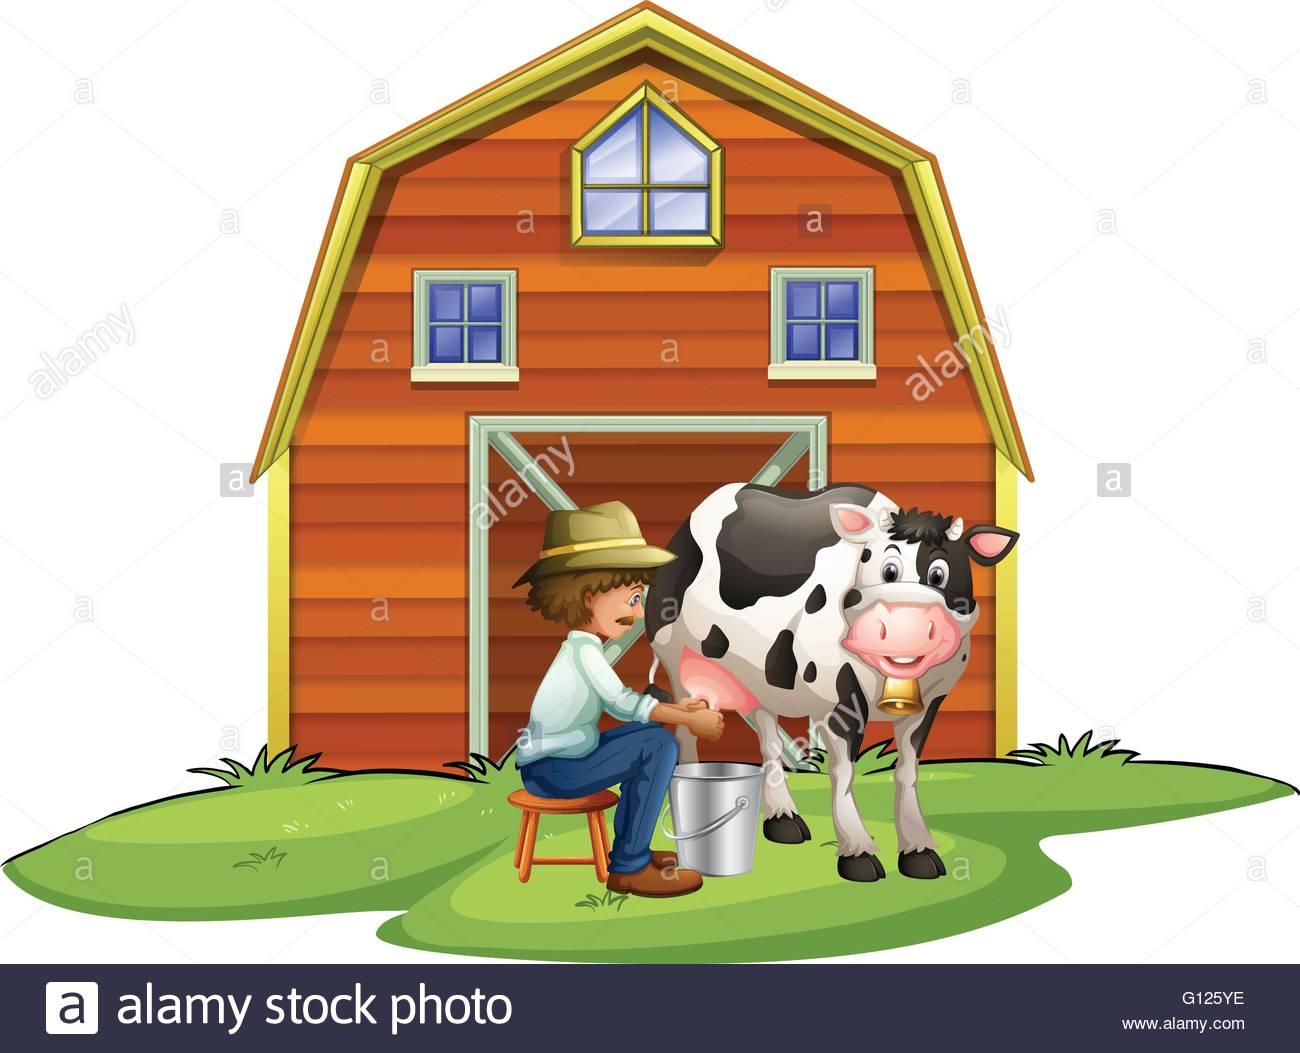 Cows clipart home. Cow house portal